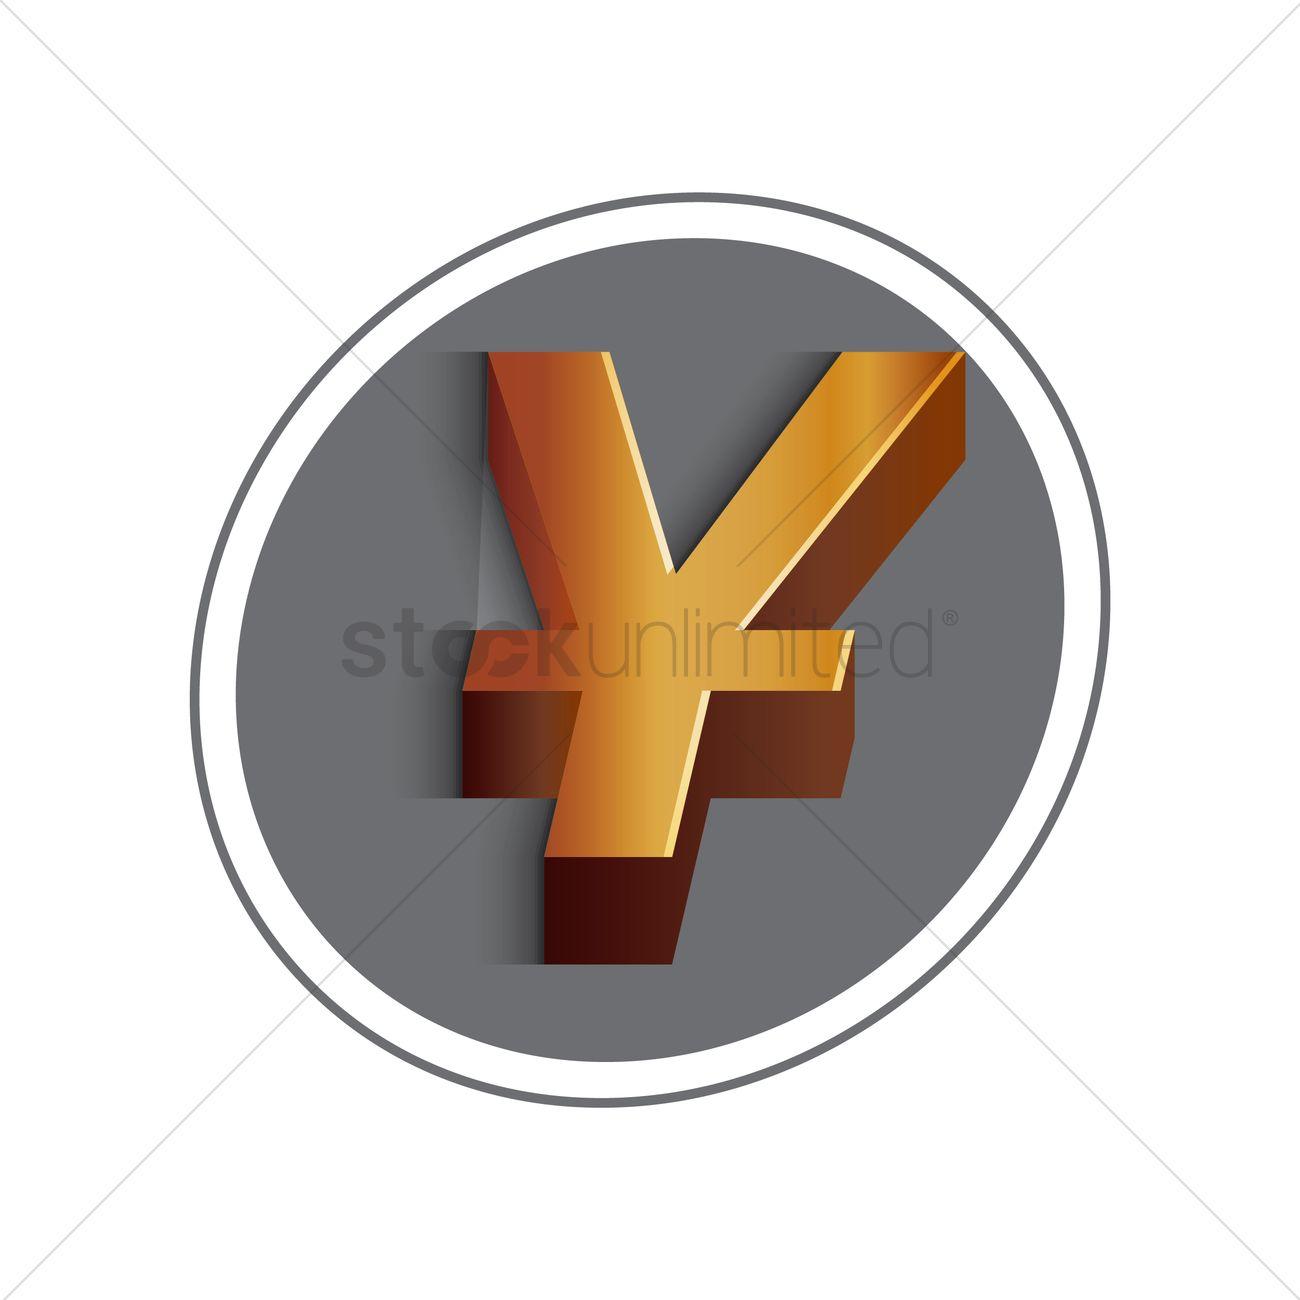 Yuan currency symbol vector image 1611893 stockunlimited yuan currency symbol vector graphic biocorpaavc